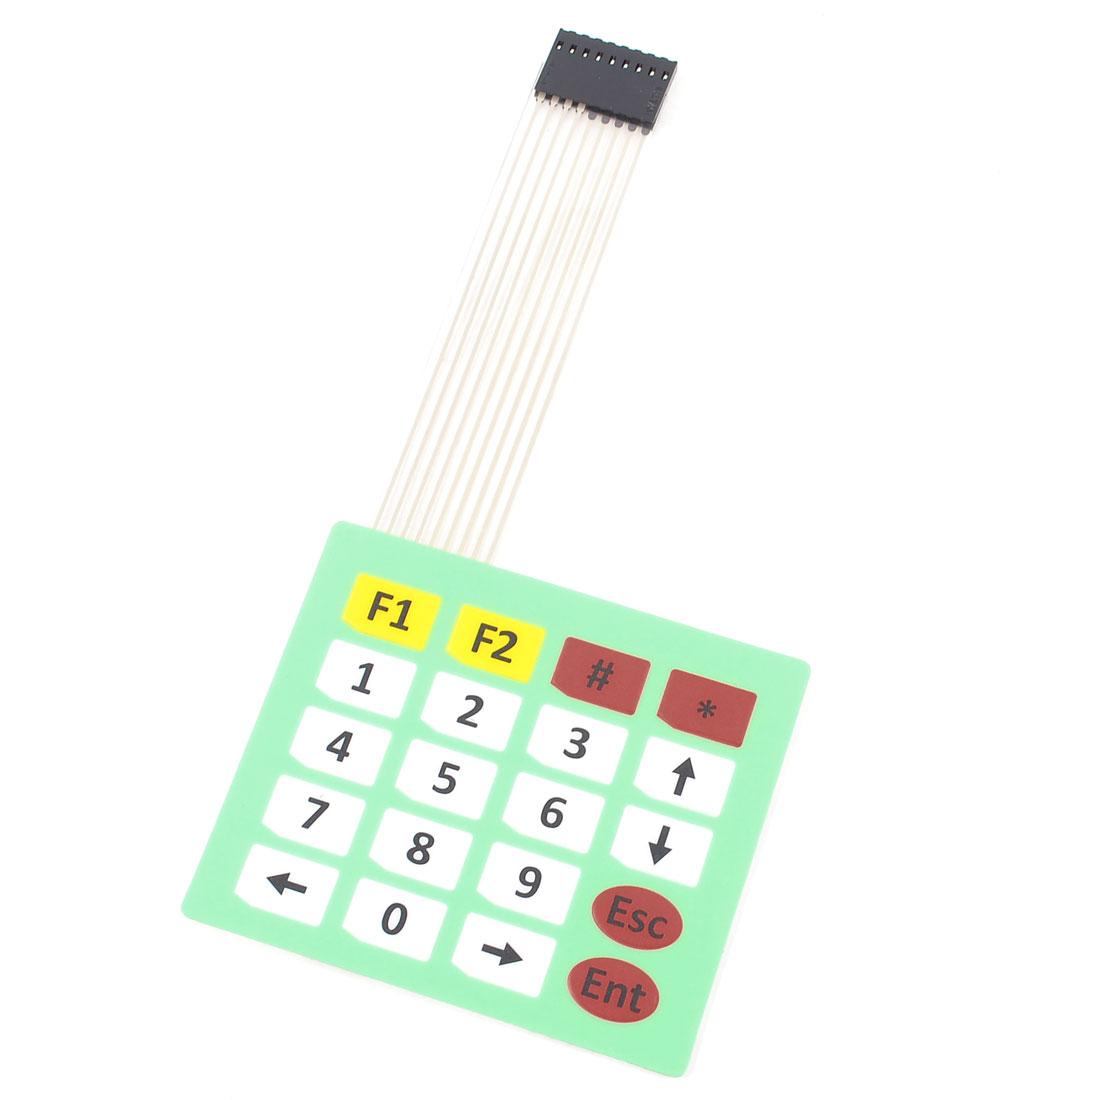 Array 4x5 20 Keys 8Pins Flex Flat Ribbon Cable Extended Numeric Membrane Switch Keyboard